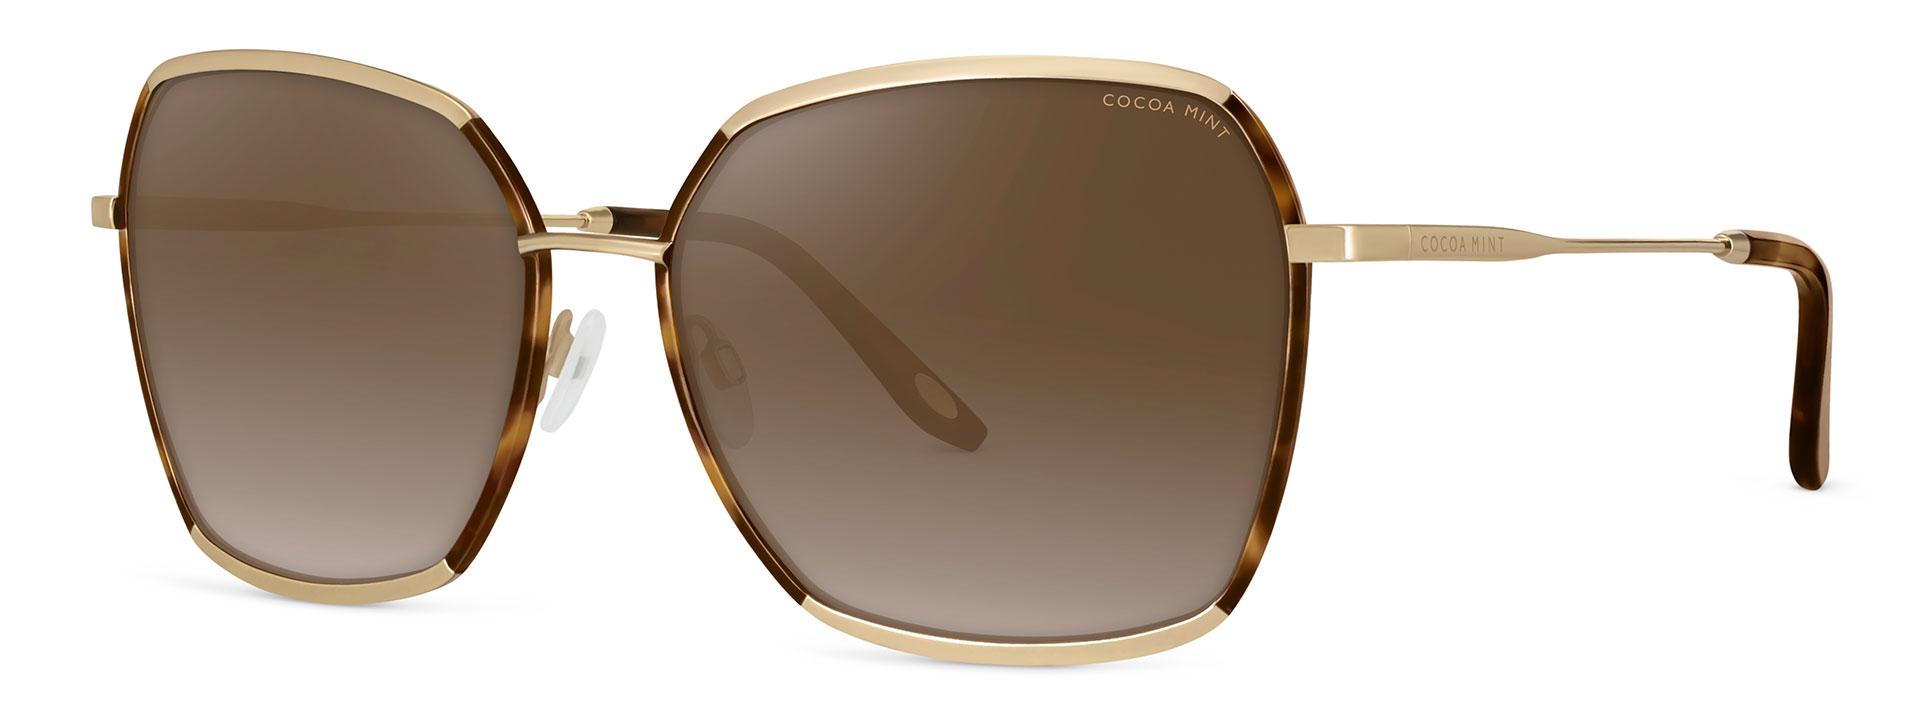 Cocoa Mint Sun Glasses - C1 Gold:Tortoiseshell - CMS2566-C1